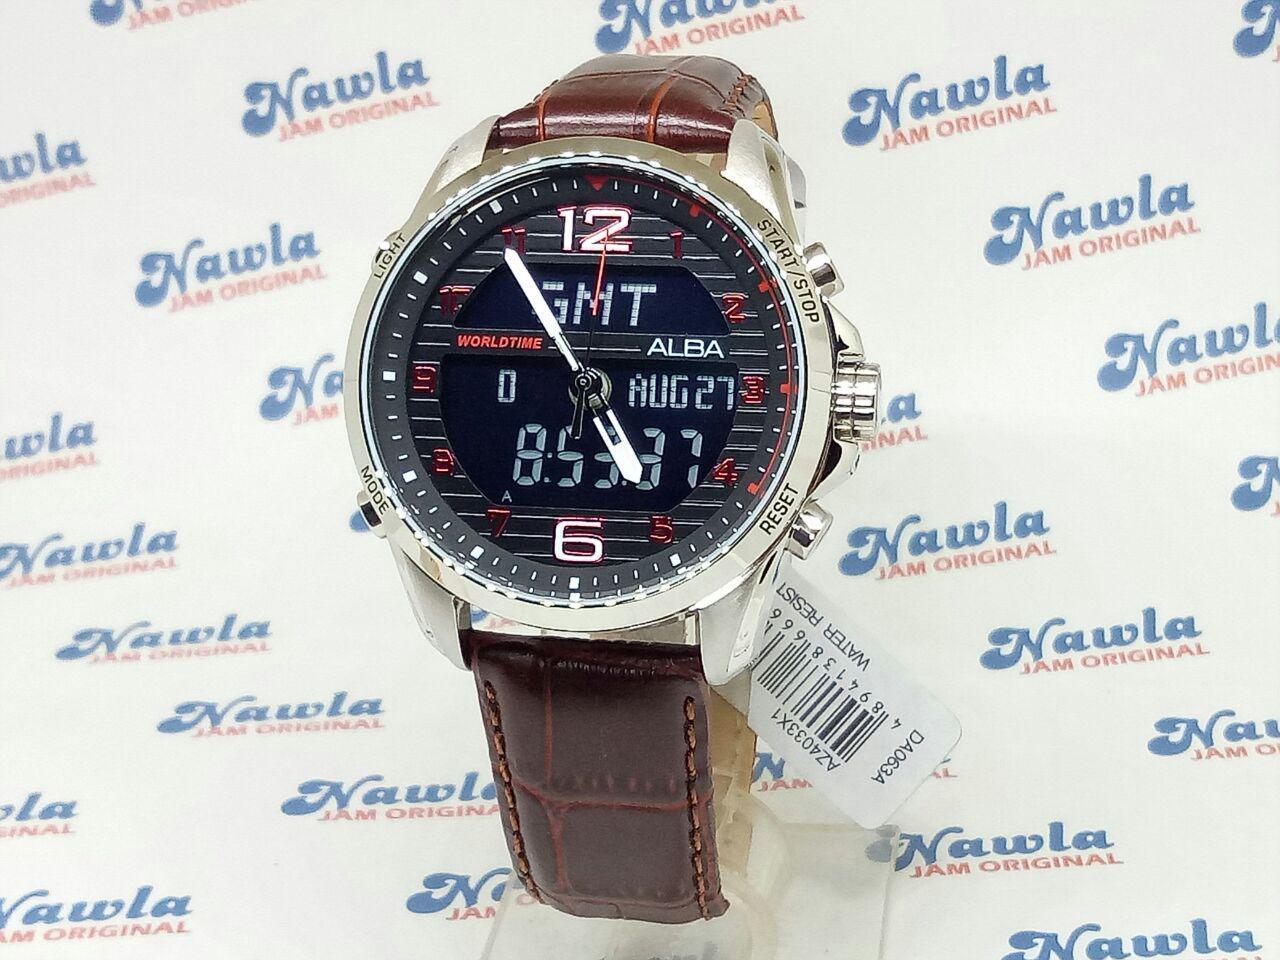 Alba Digital AZ4033X1 World Time Brown Leather Jam Tangan Pria AZ4033 6aed151514